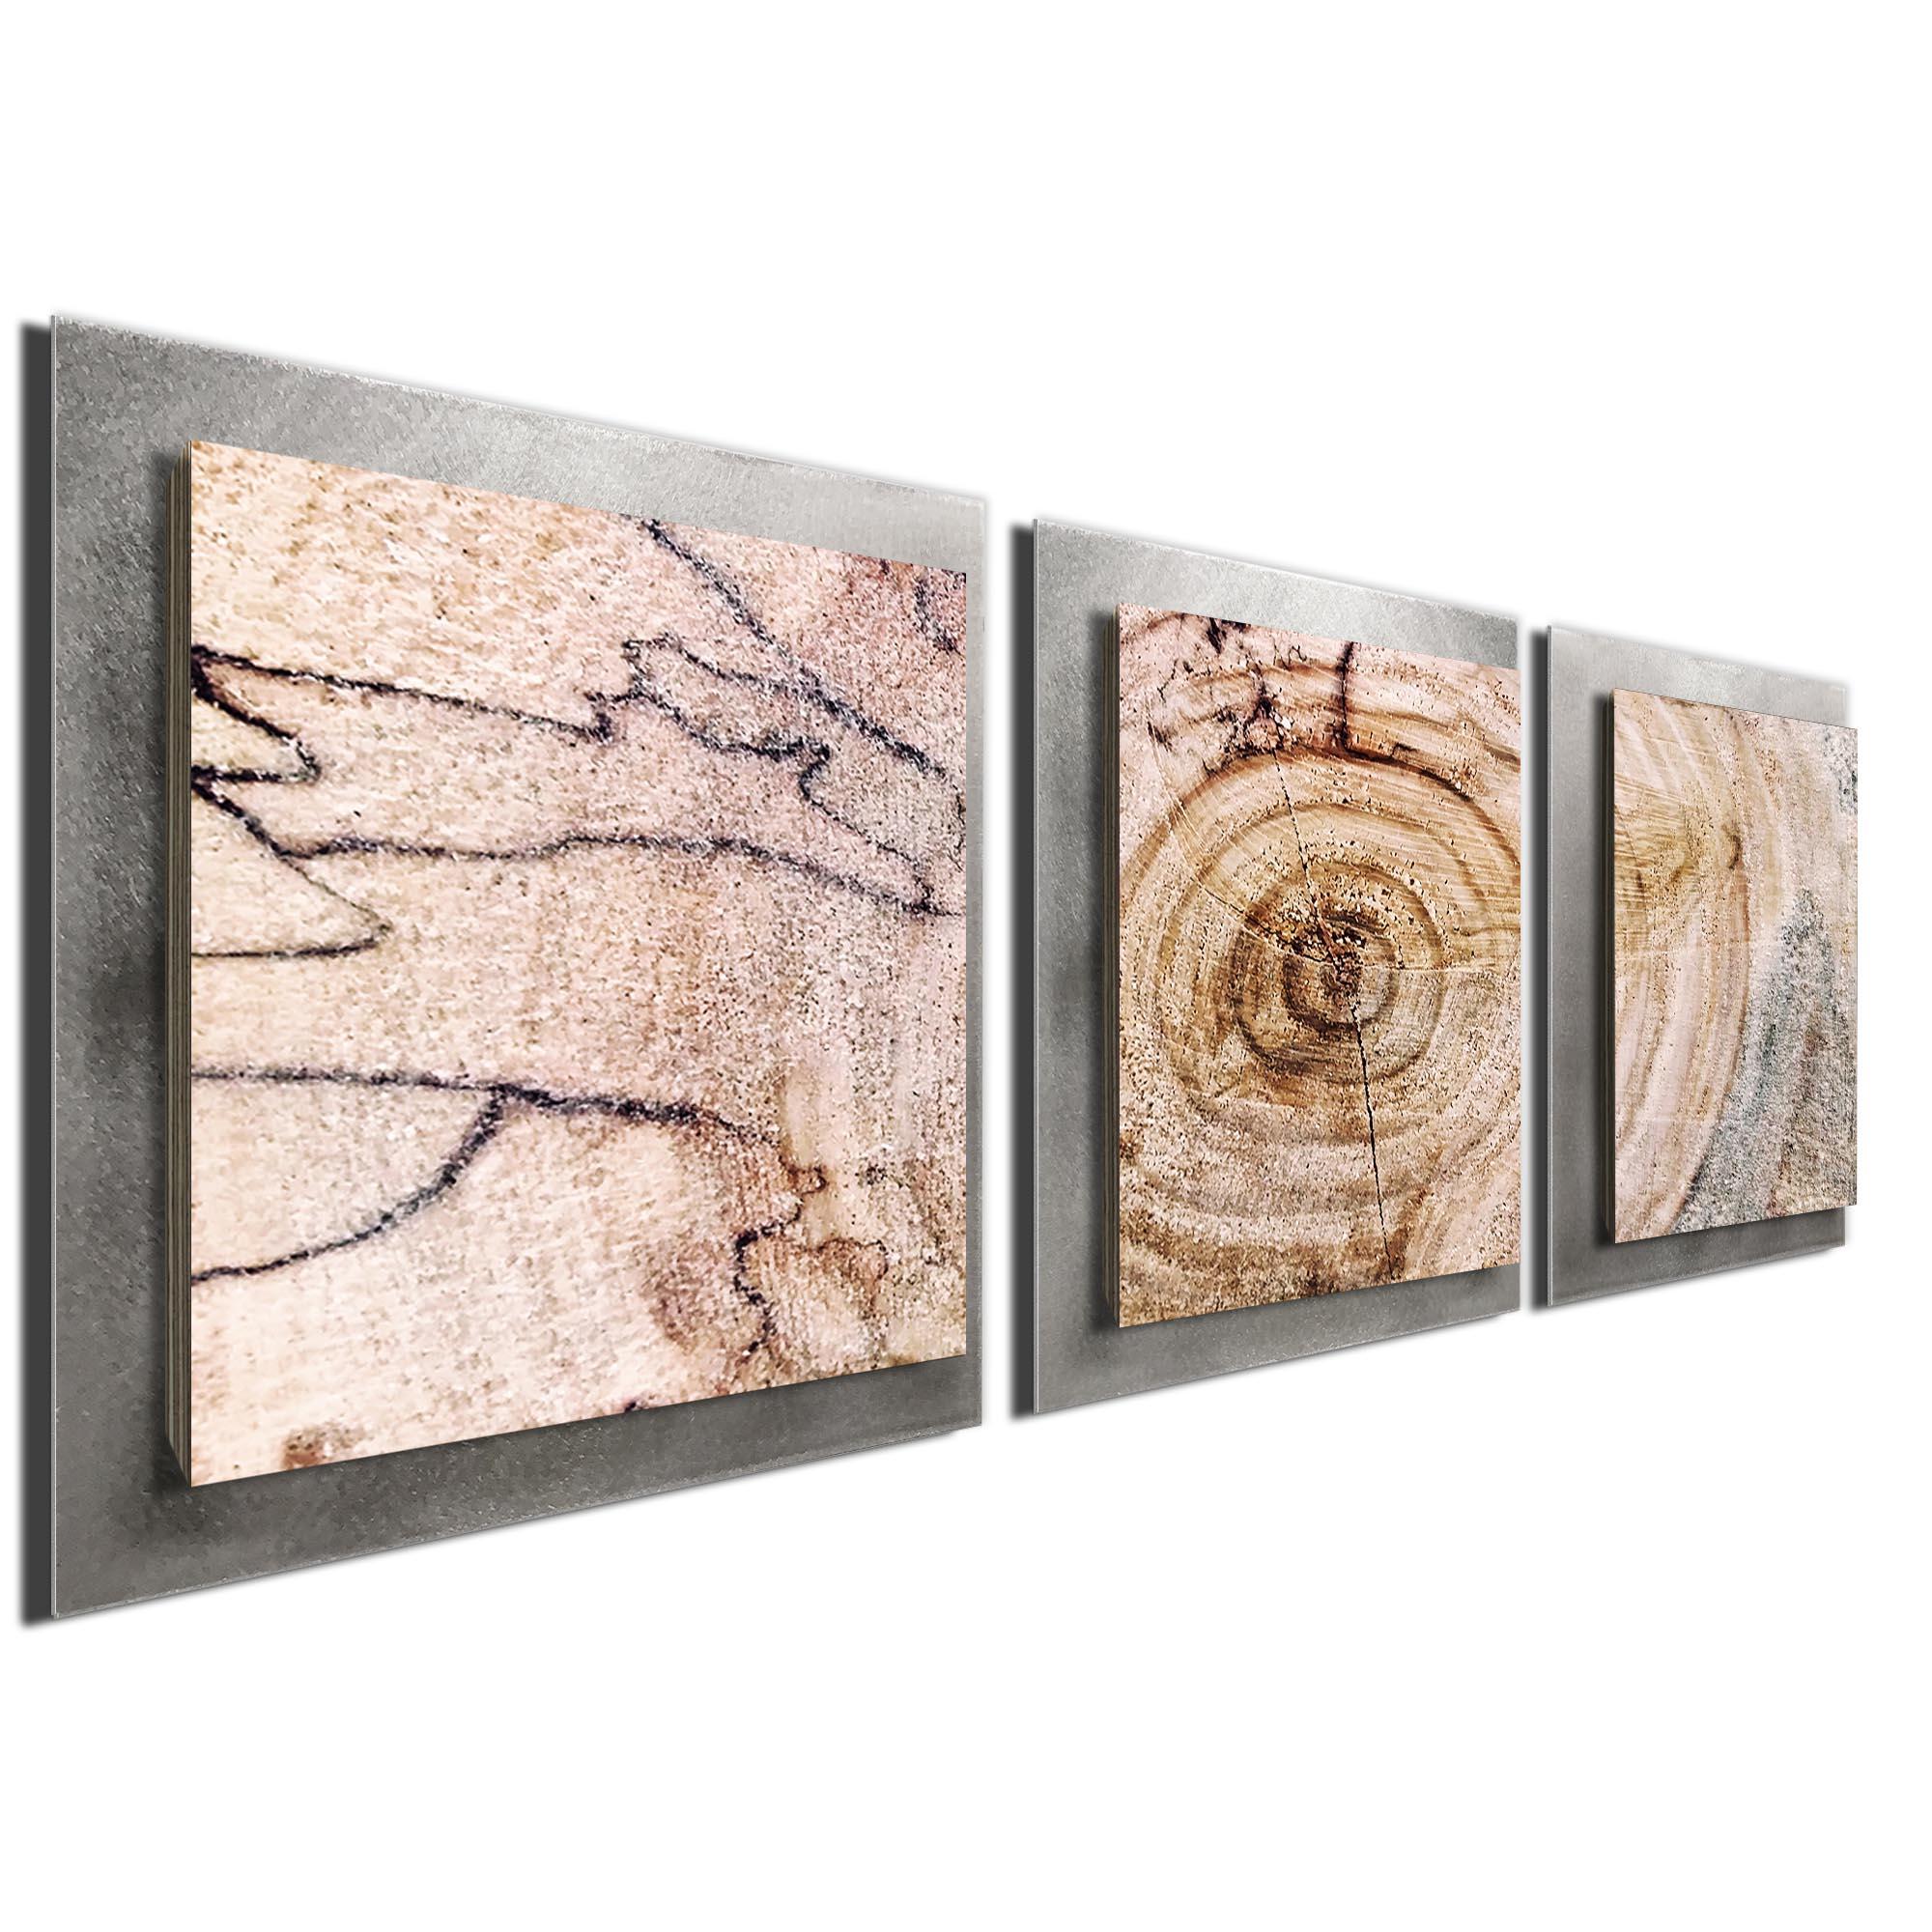 Aged Wood Essence Silver by Adam Schwoeppe Rustic Modern Style Wood Wall Art - Image 2